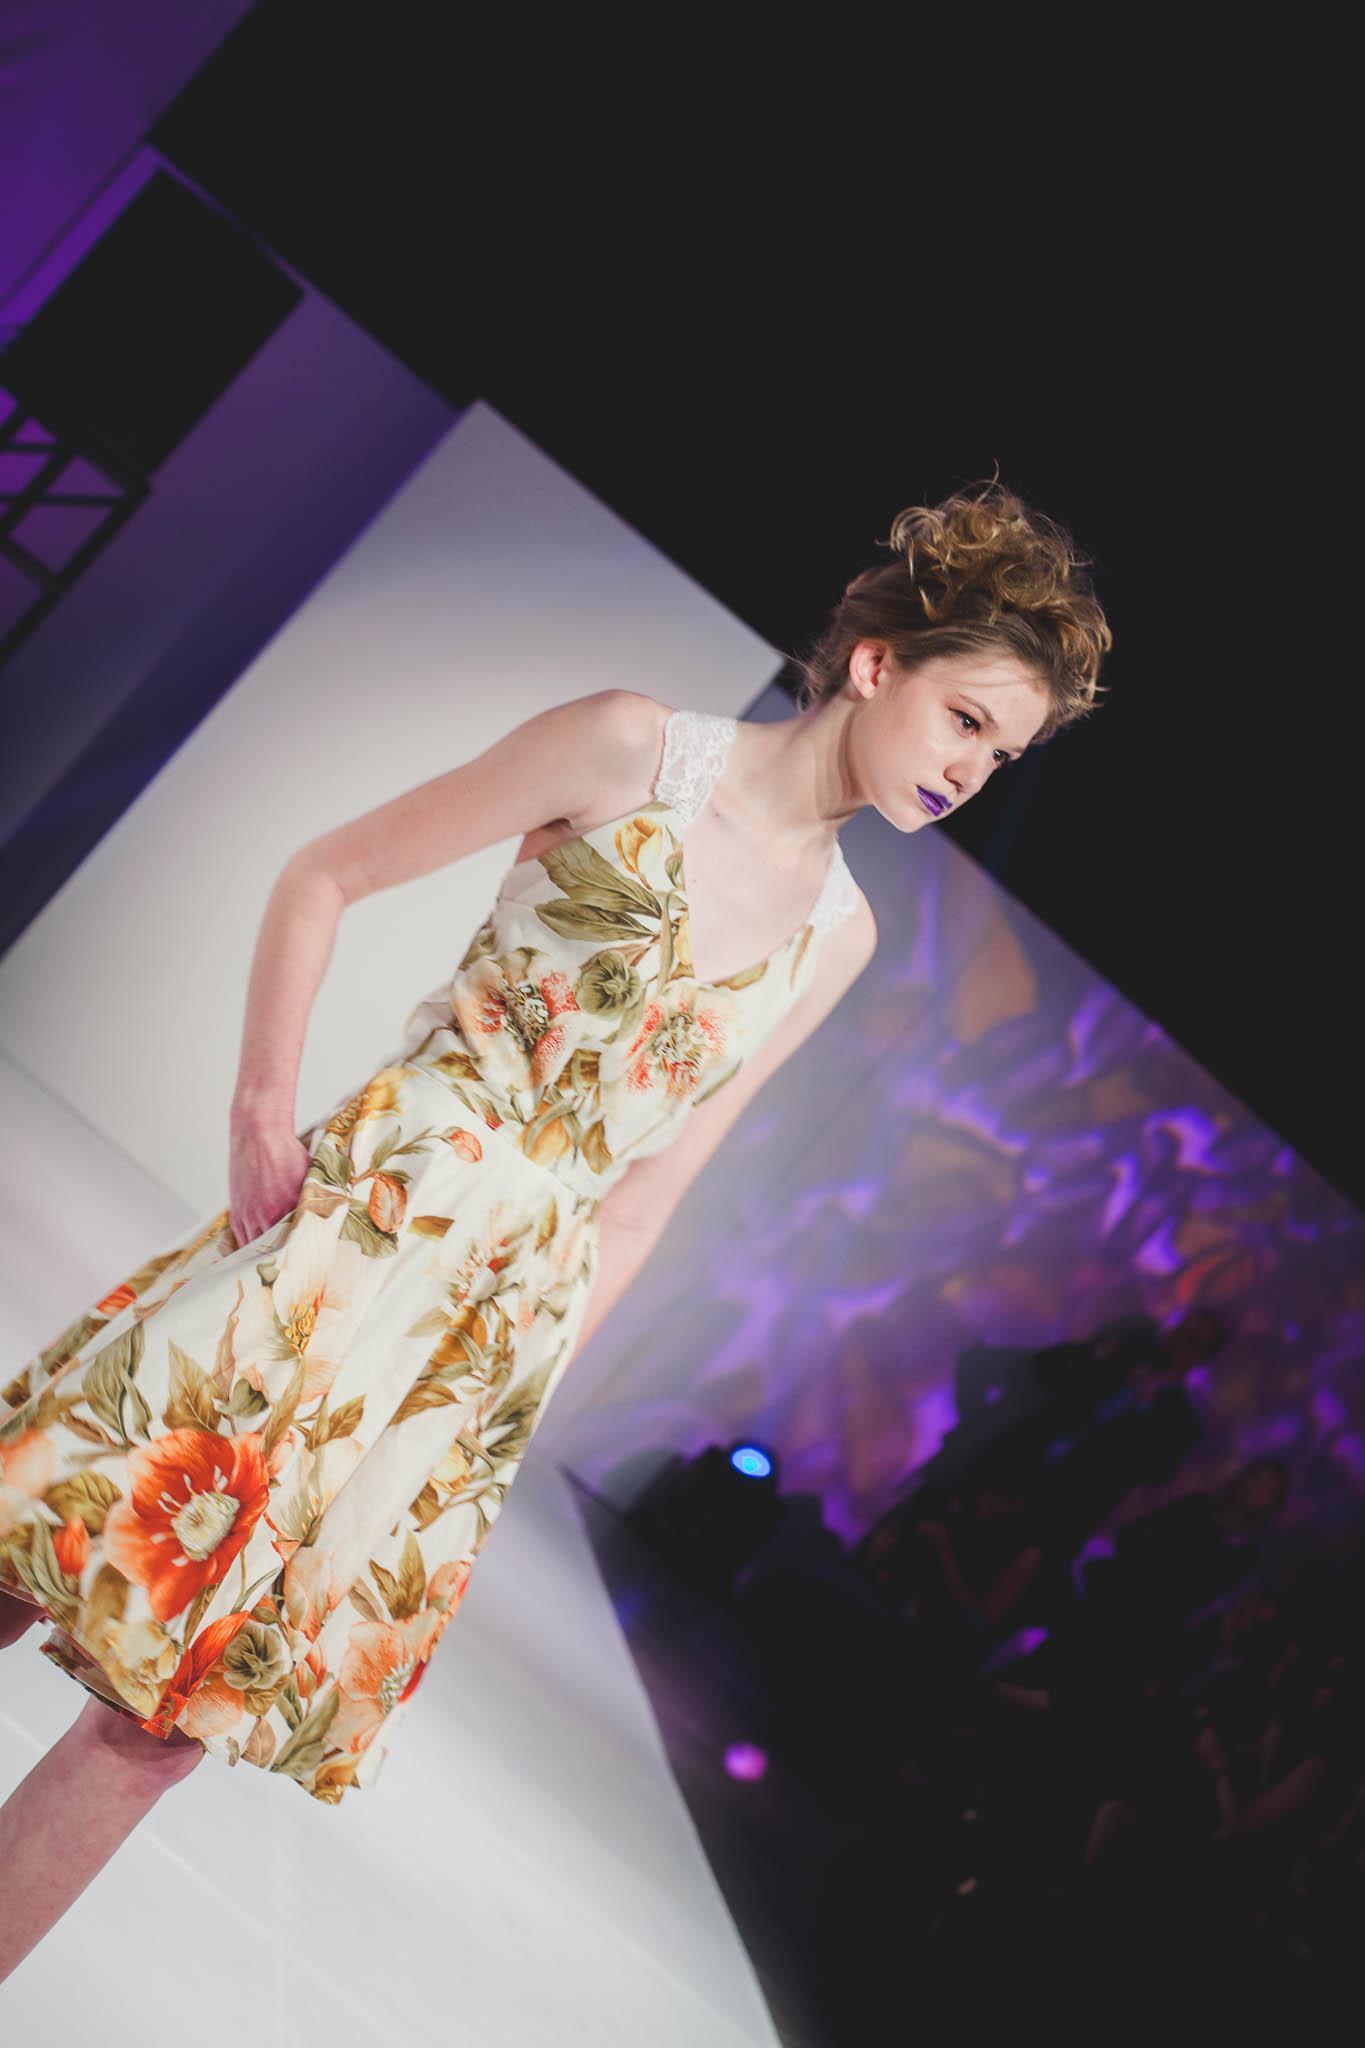 authentic photos and designs nashville designer showcase-17.jpg